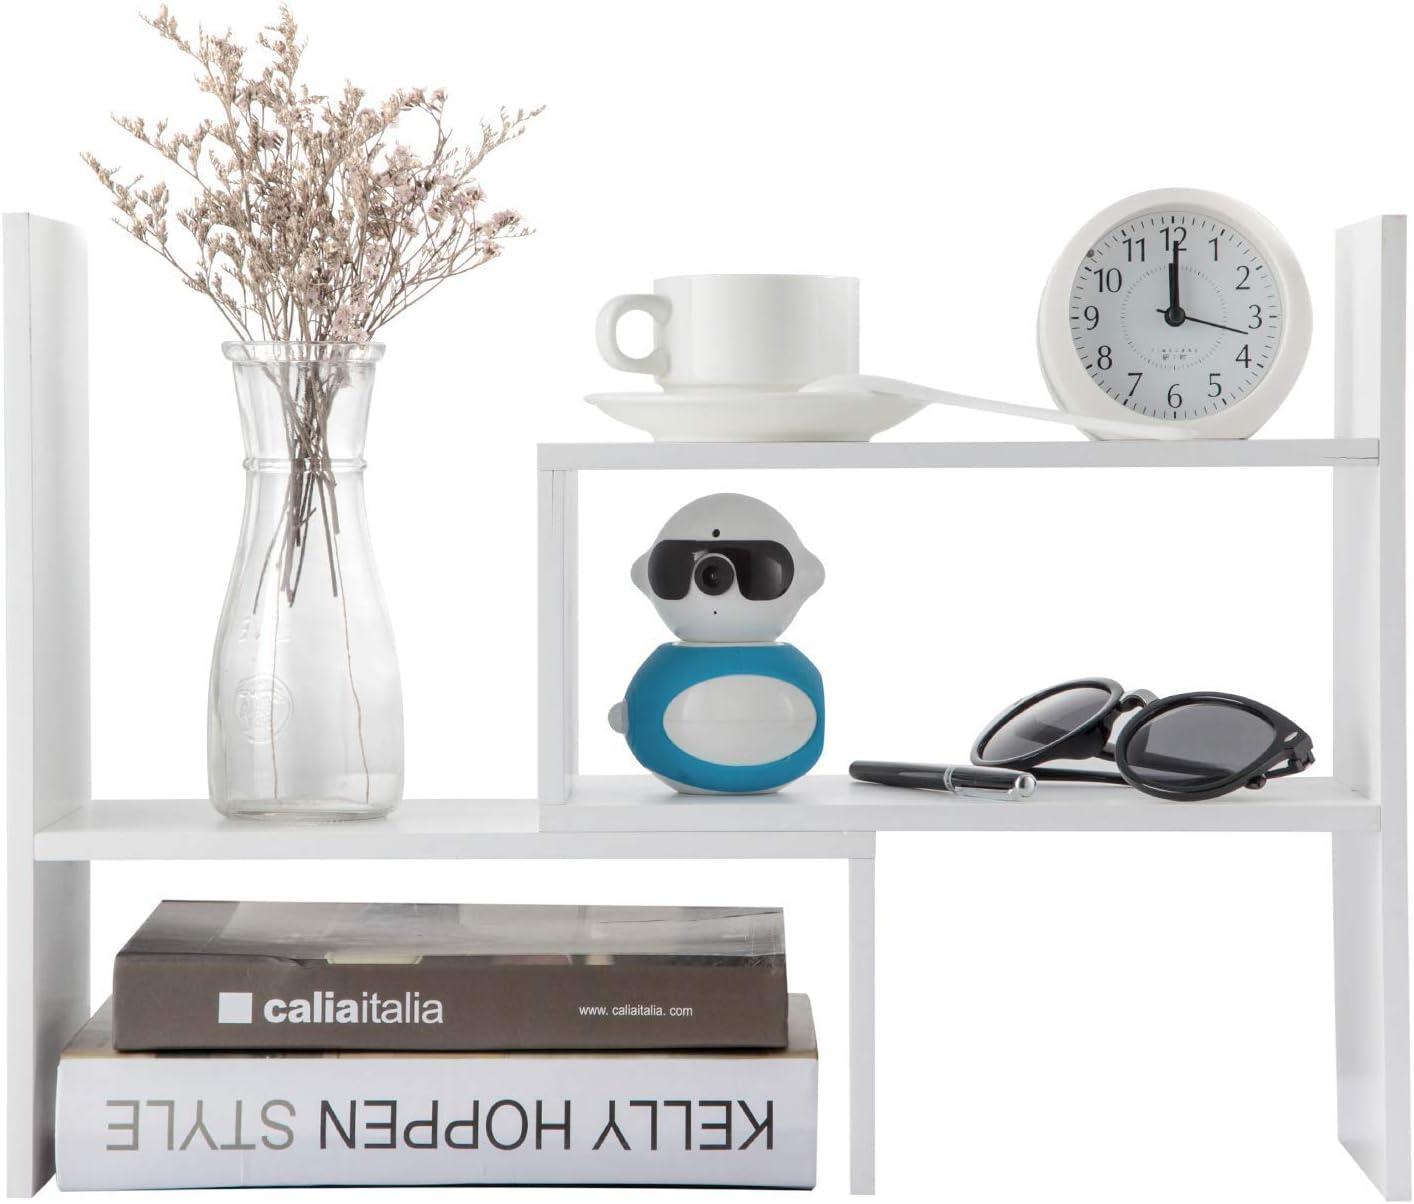 Home-Neat Wood Adjustable Desktop Storage Organizer Display Shelf Rack, Office Supplies Desk Organizer (Black) (Black)